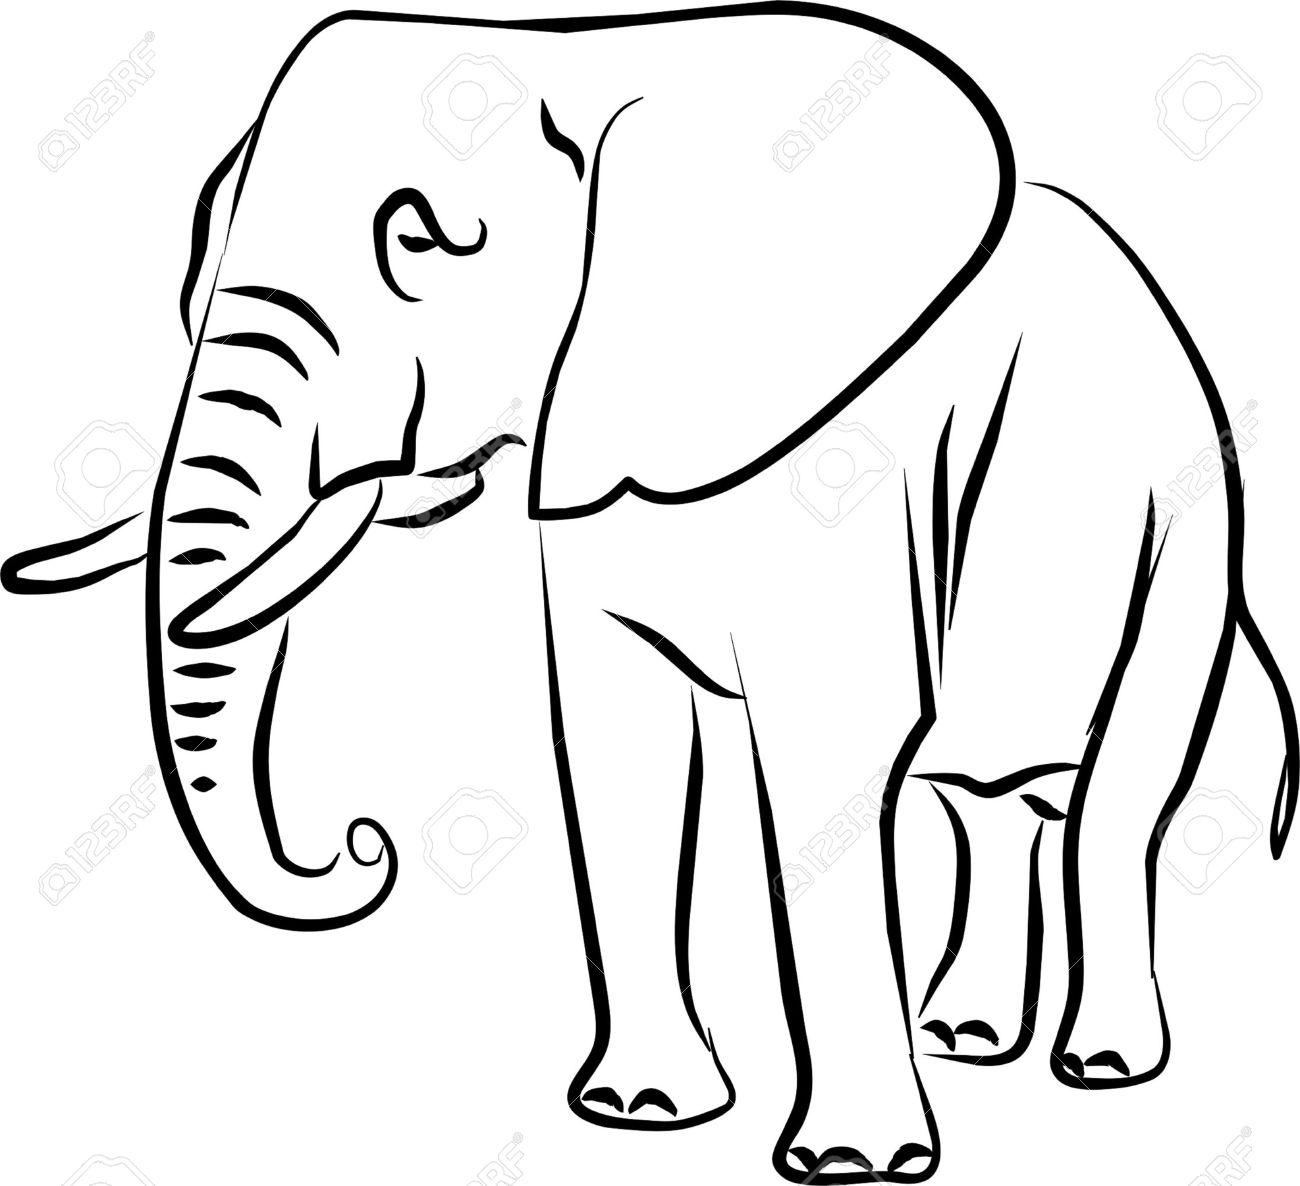 African bush elephant clipart.